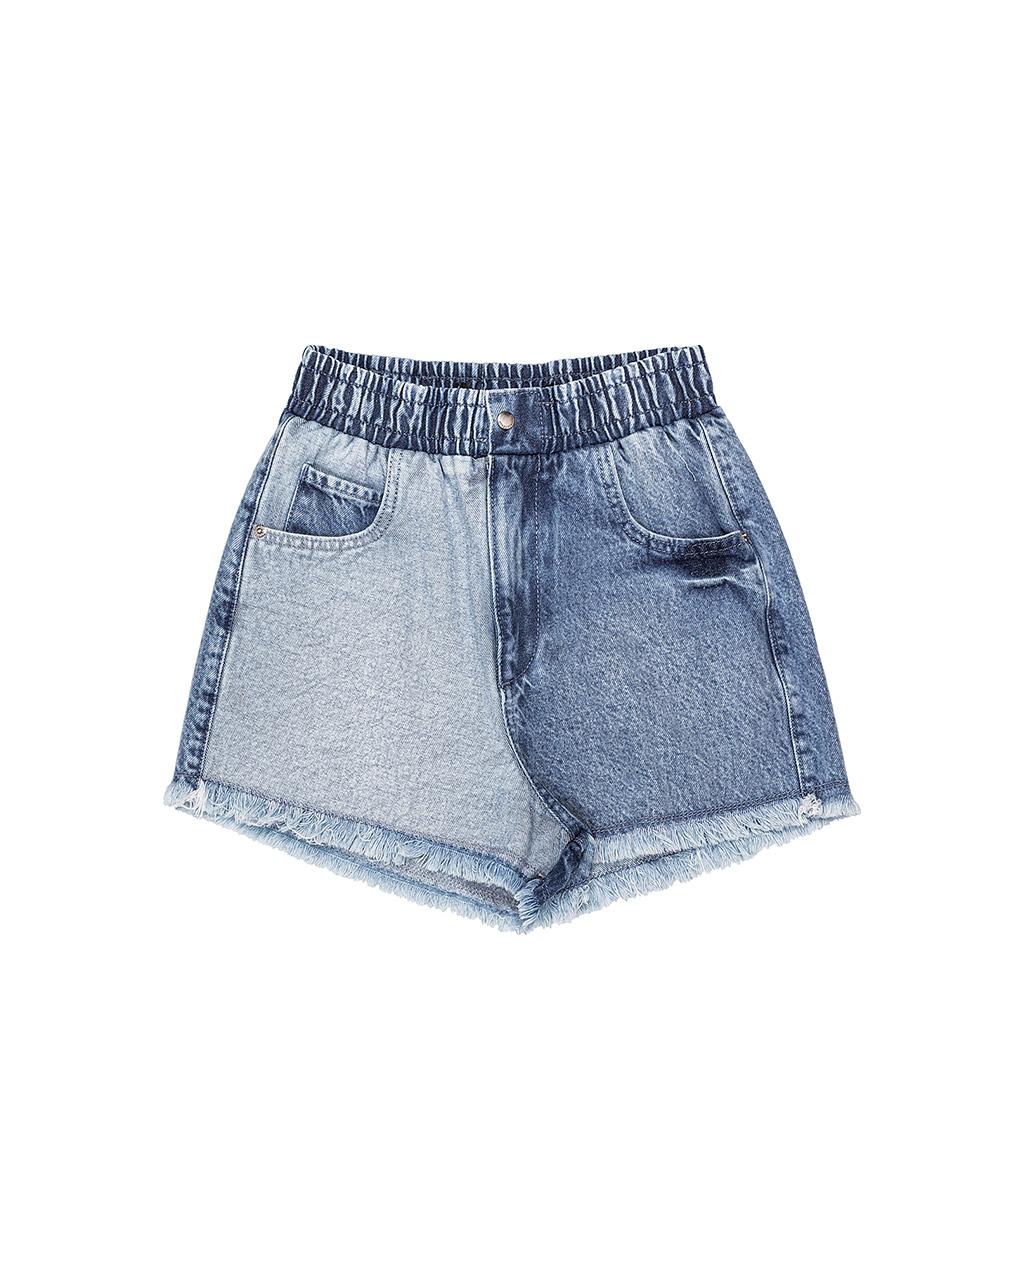 Shorts Teen Jeans Duas Lavagens Cós Elástico Authoria